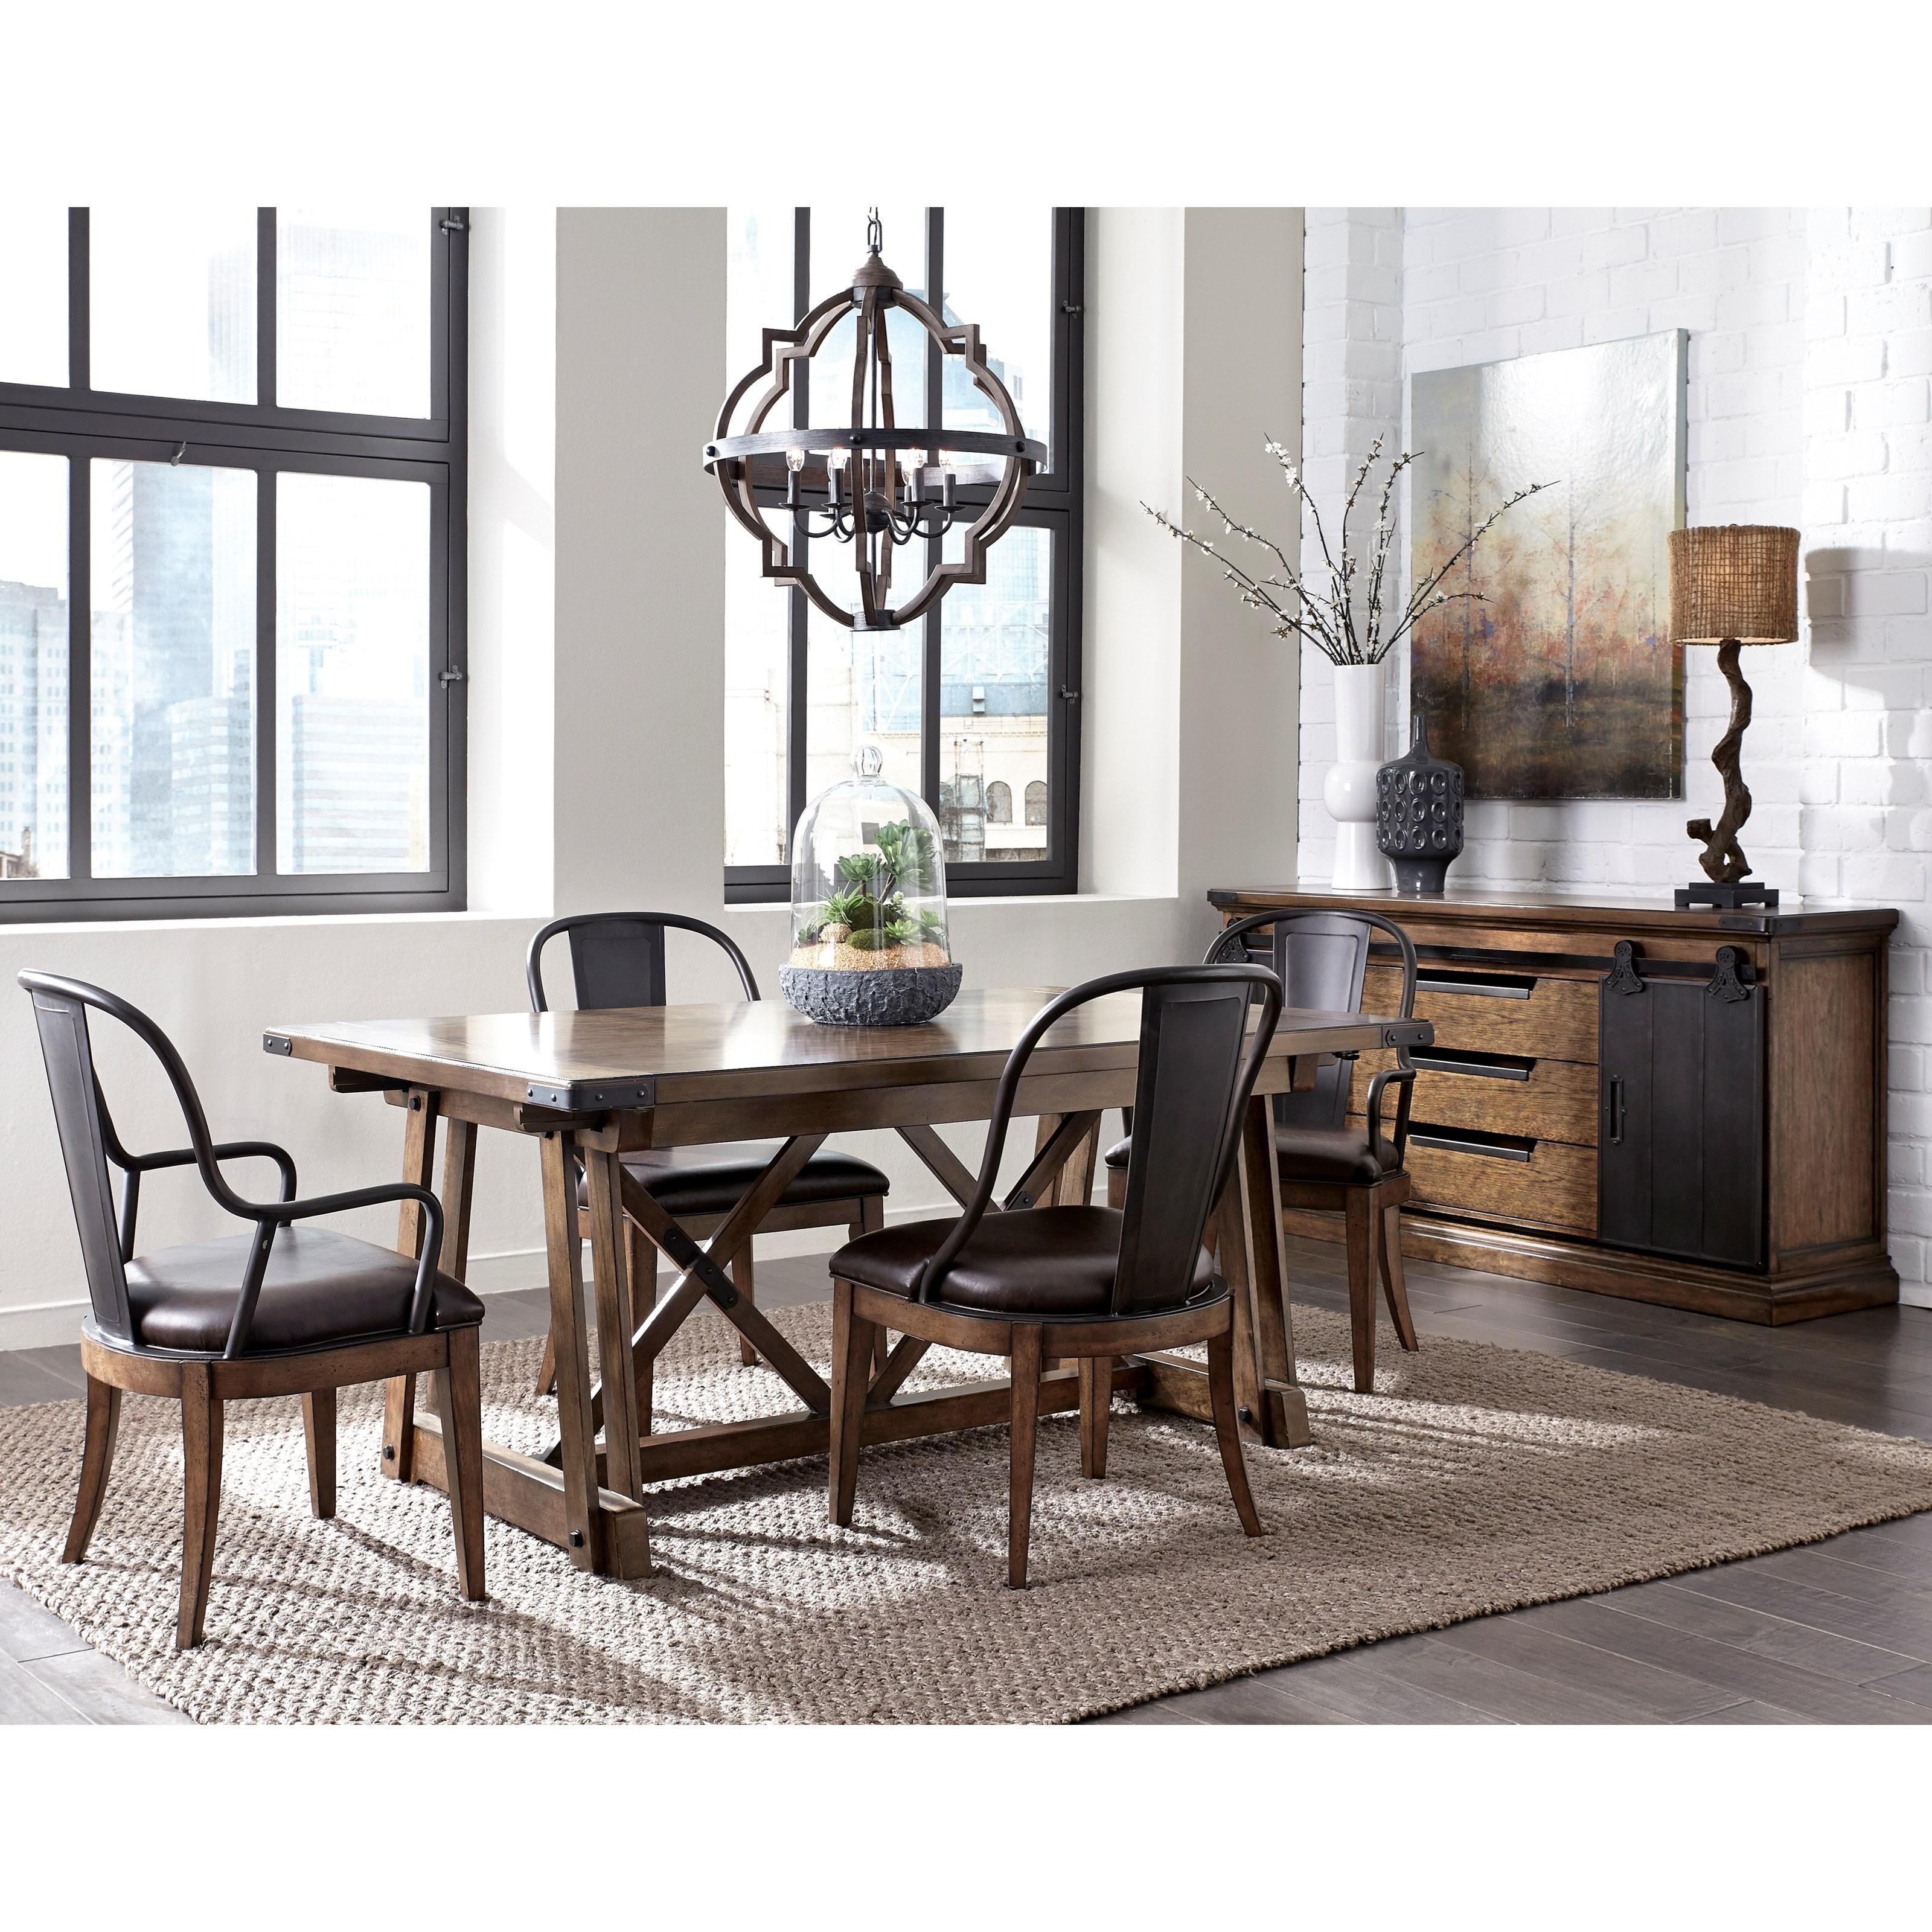 Pulaski Furniture Weston Loft Formal Dining Room Group